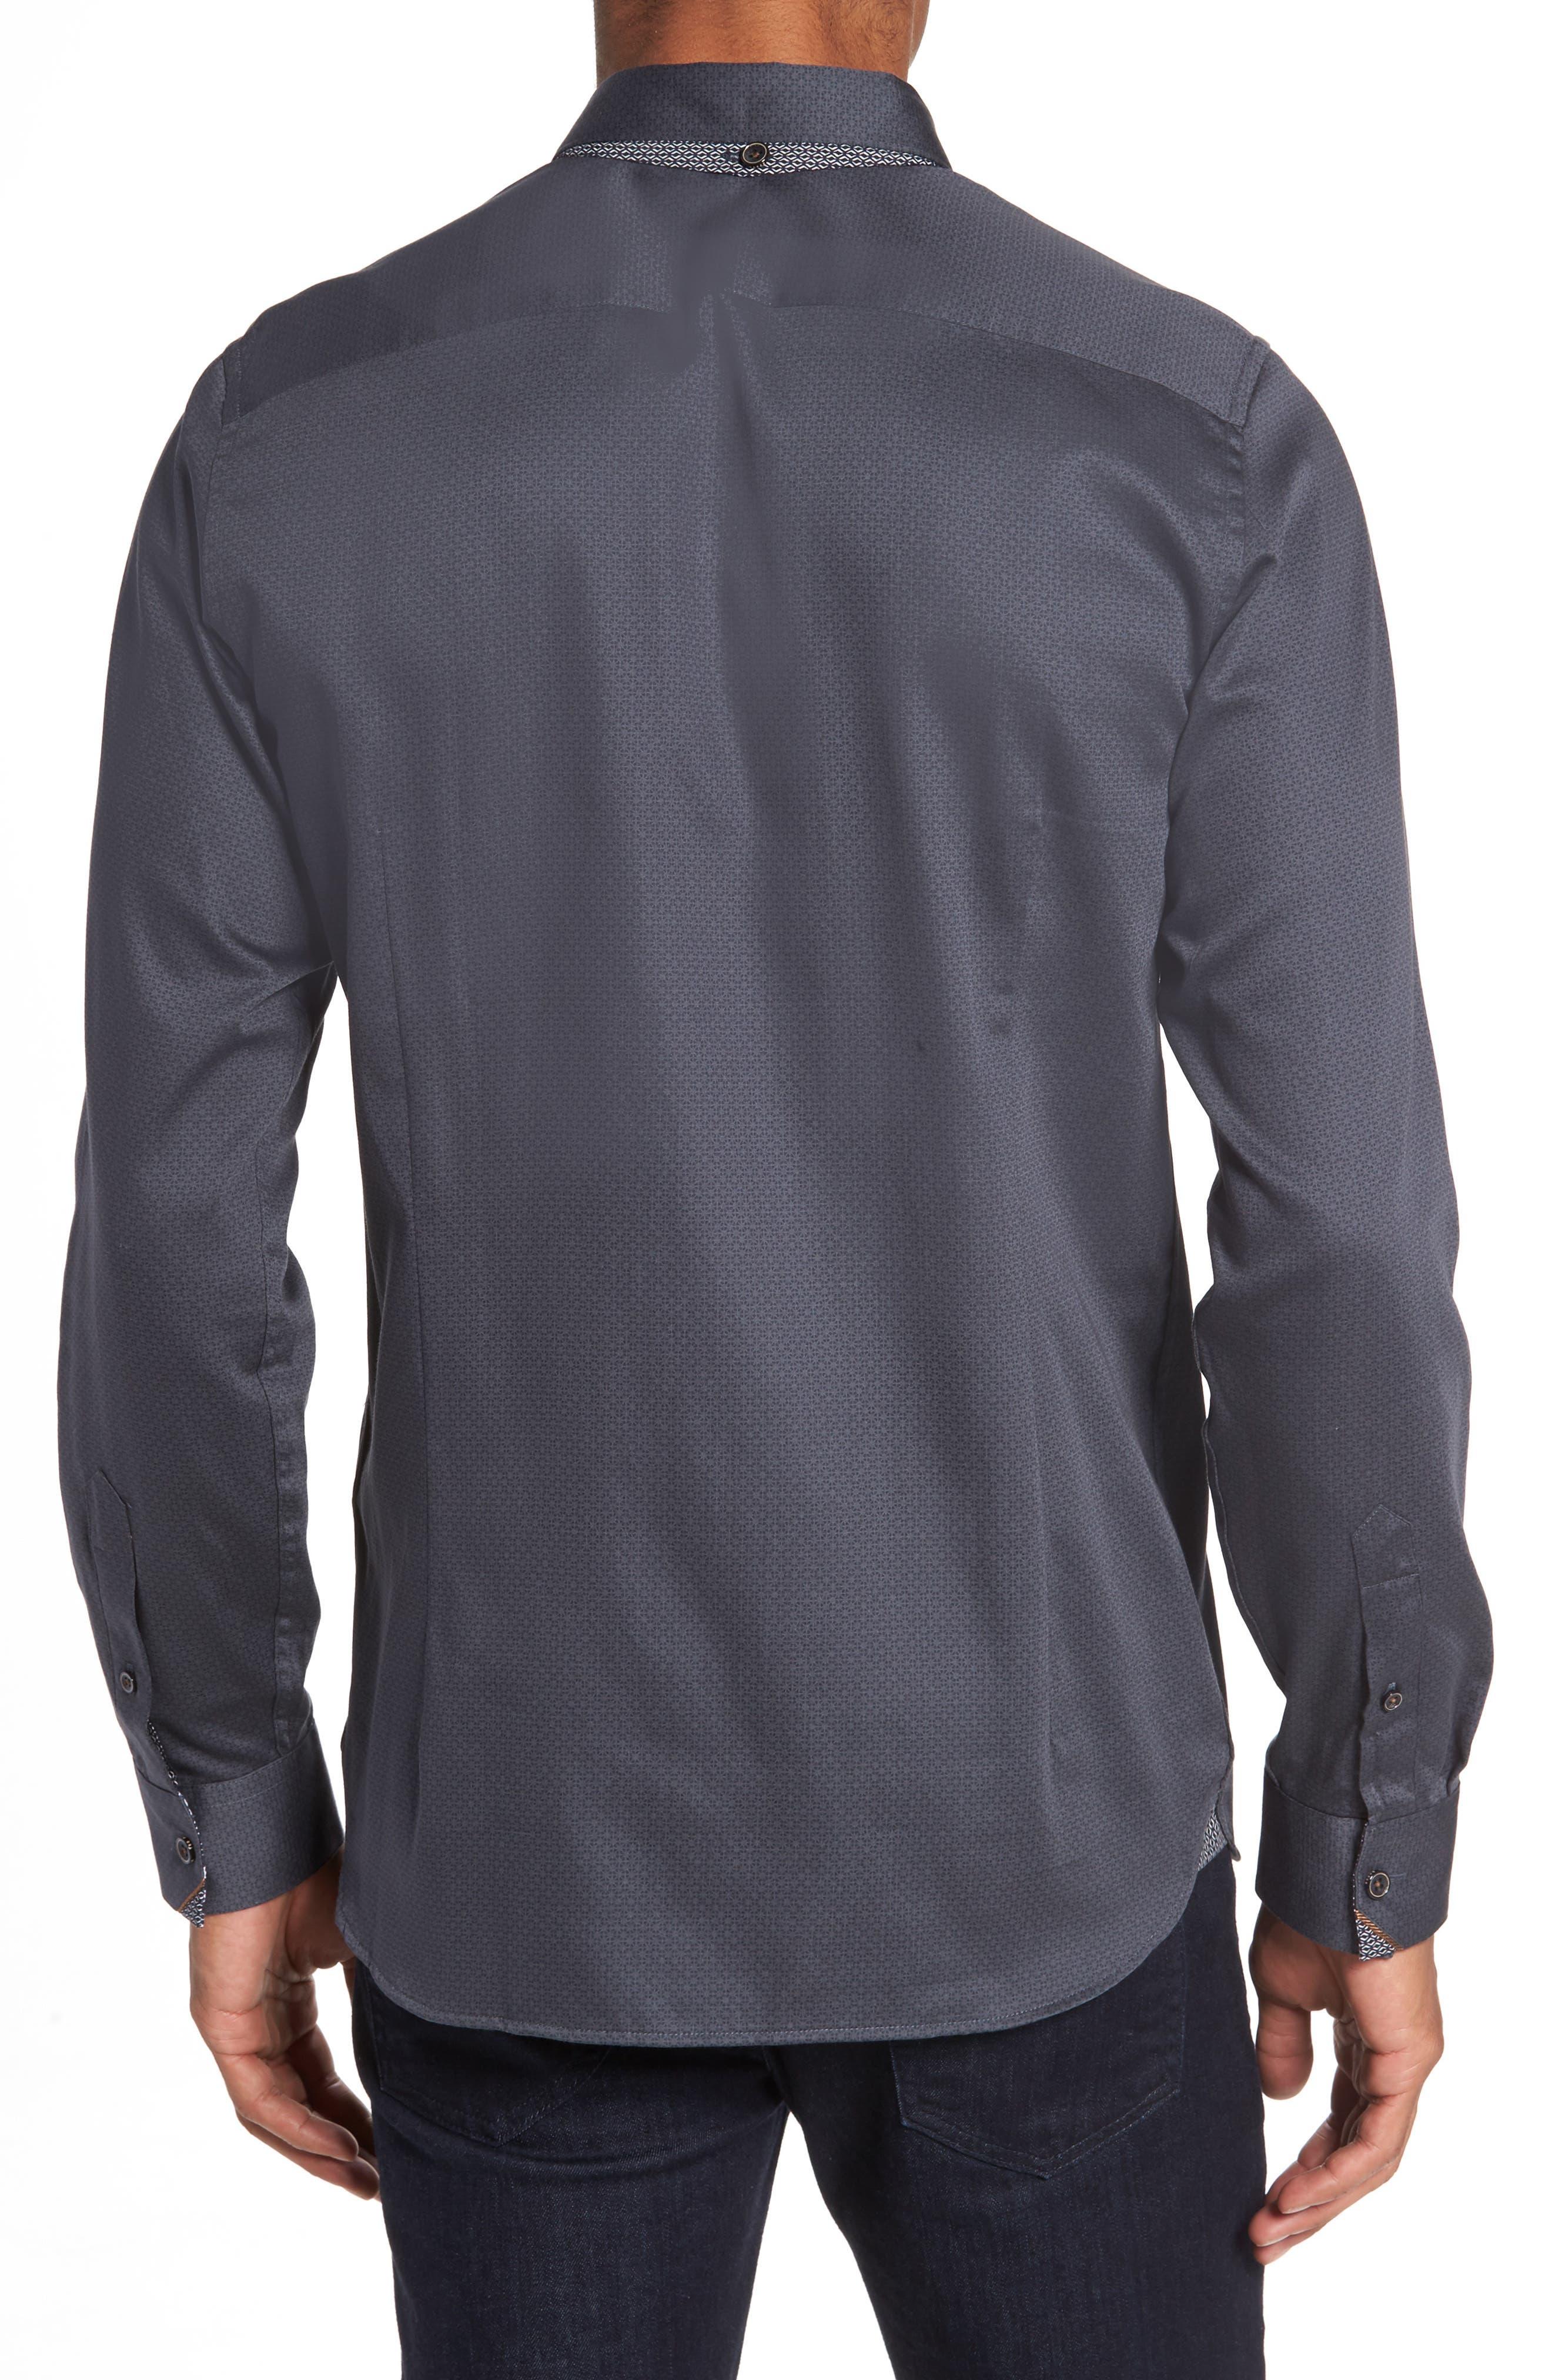 Strazbo Tonal Print Sport Shirt,                             Alternate thumbnail 2, color,                             030